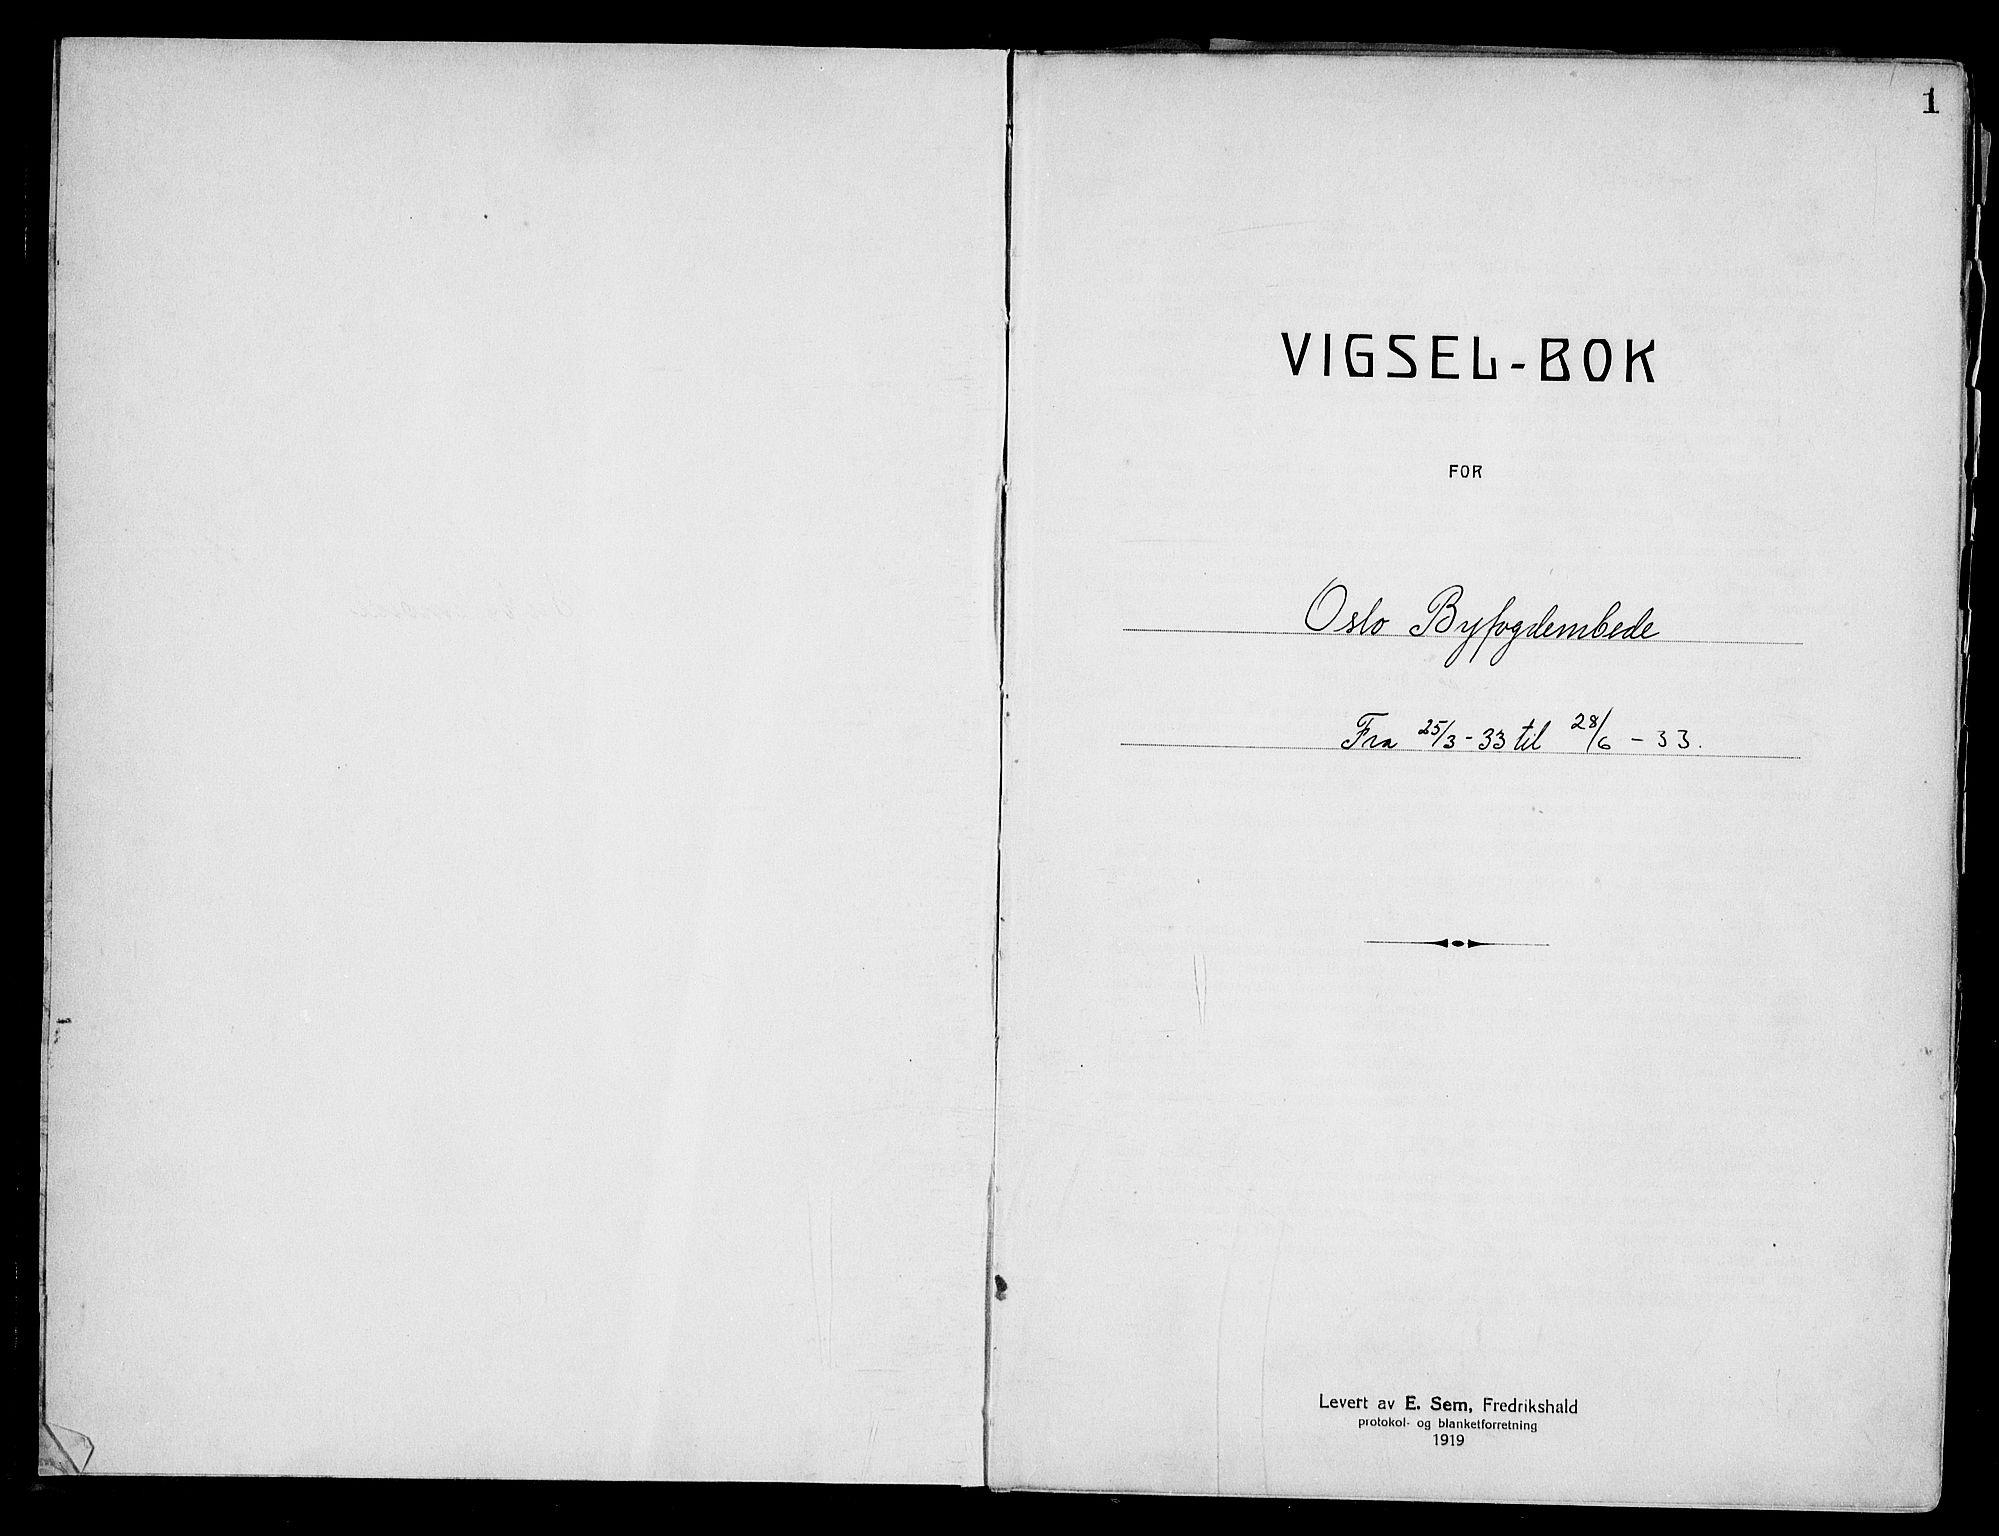 SAO, Oslo byfogd avd. I, L/Lb/Lbb/L0023: Notarialprotokoll, rekke II: Vigsler, 1933-1934, s. 1a